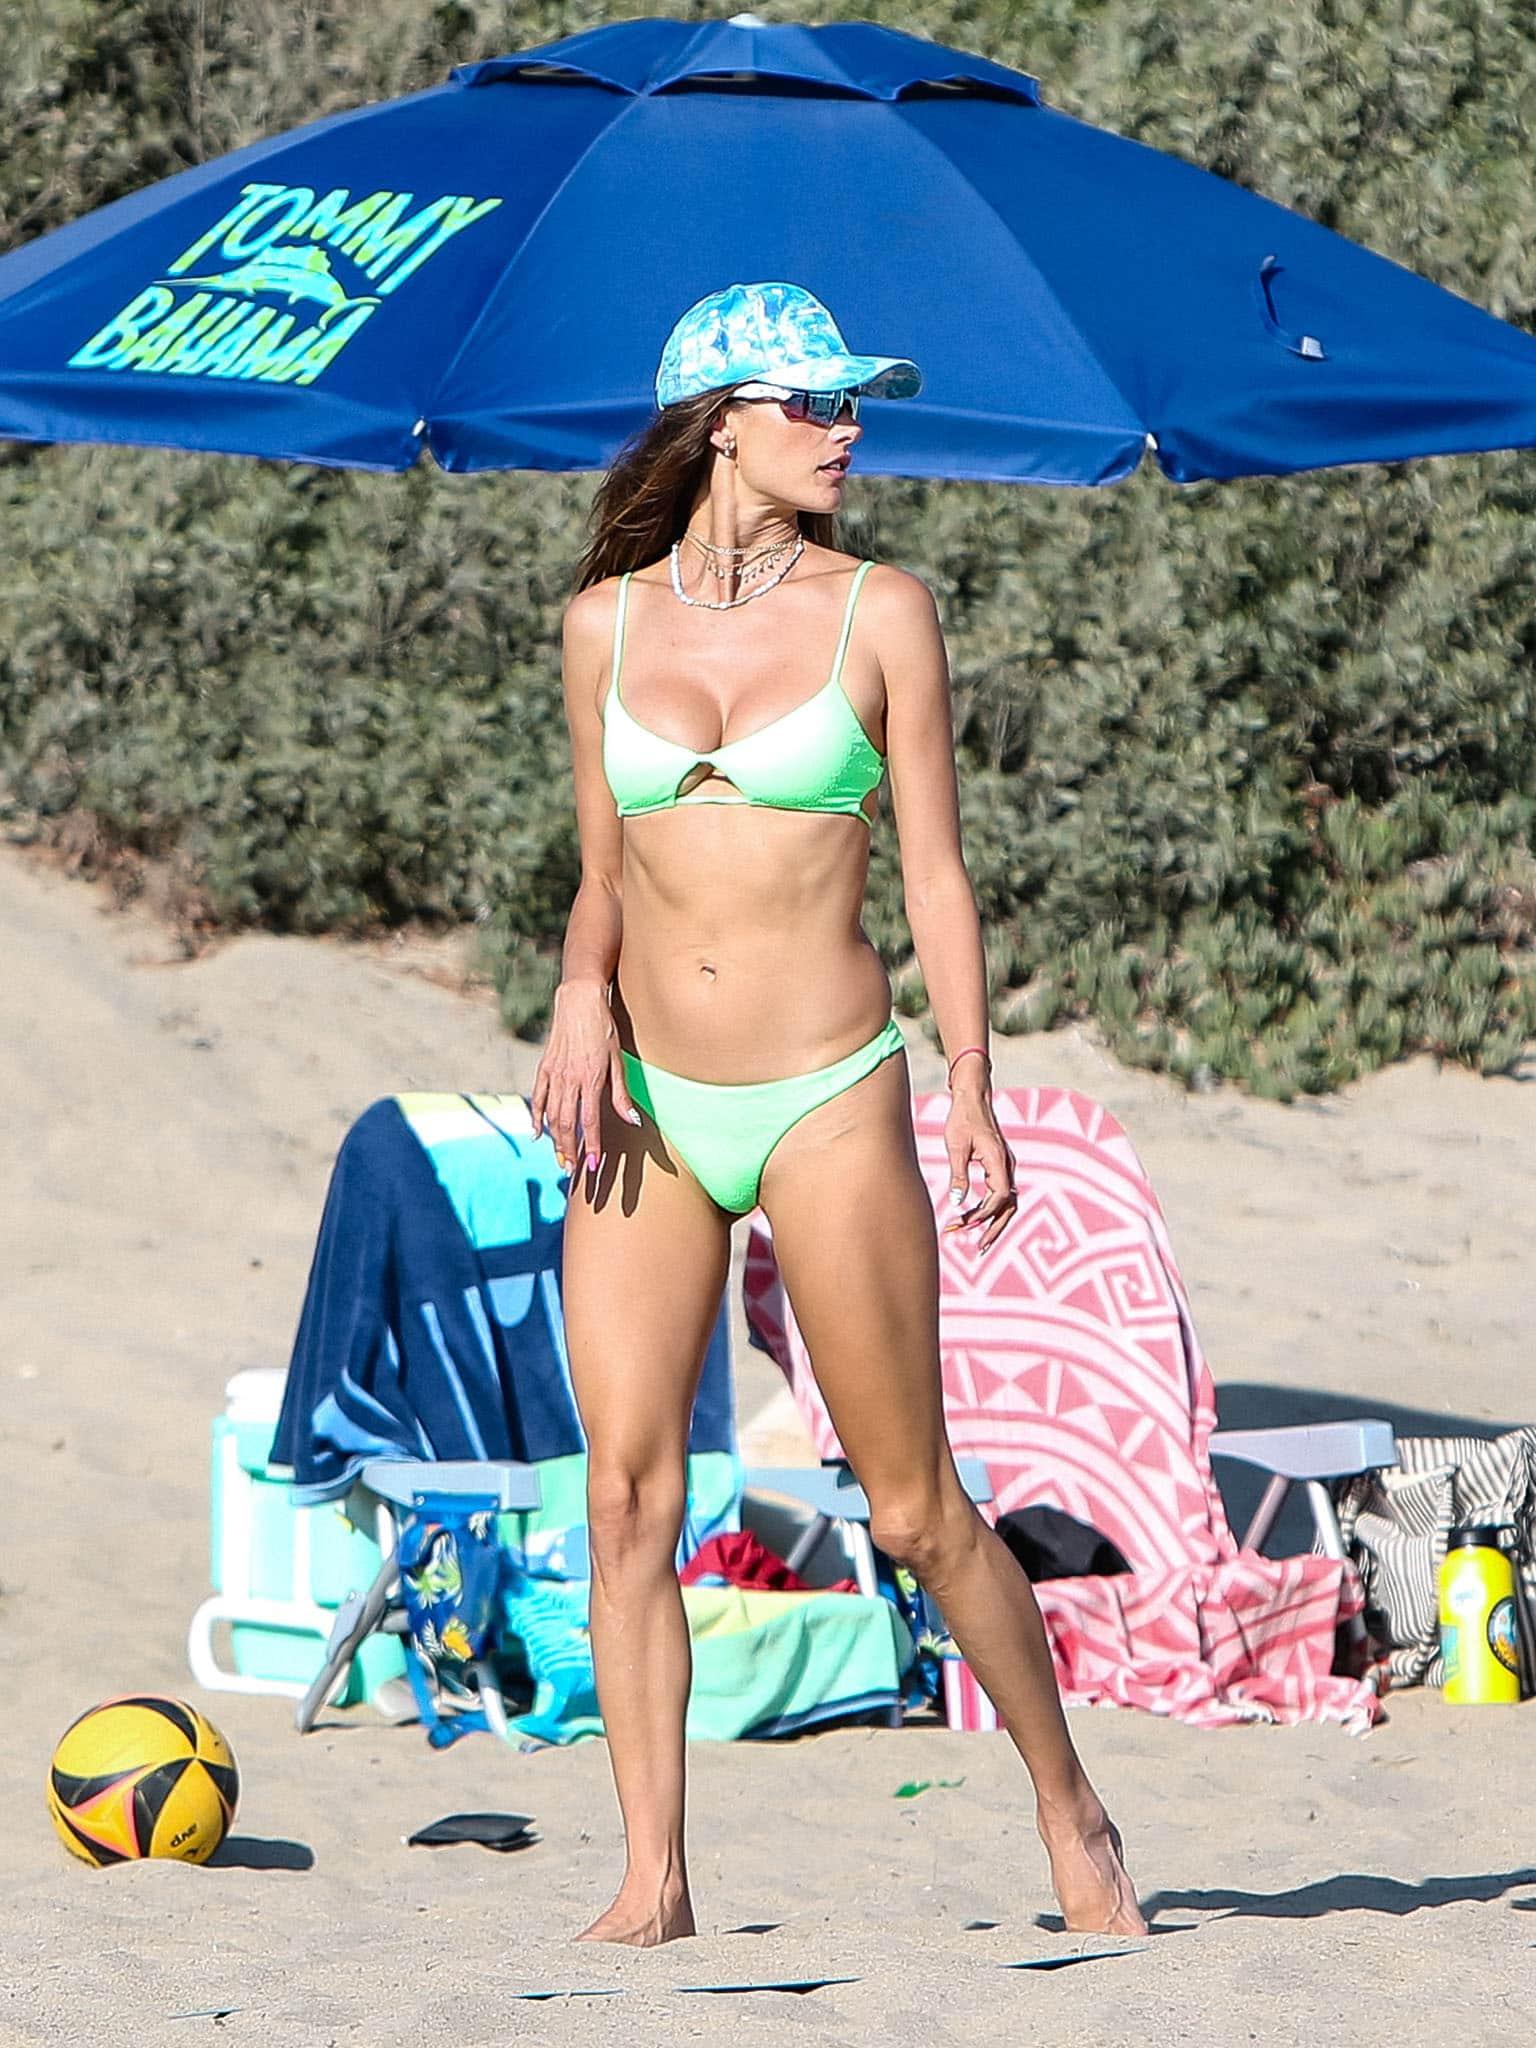 Alessandra Ambrosio flaunts her bikini body in Vix neon green bikini